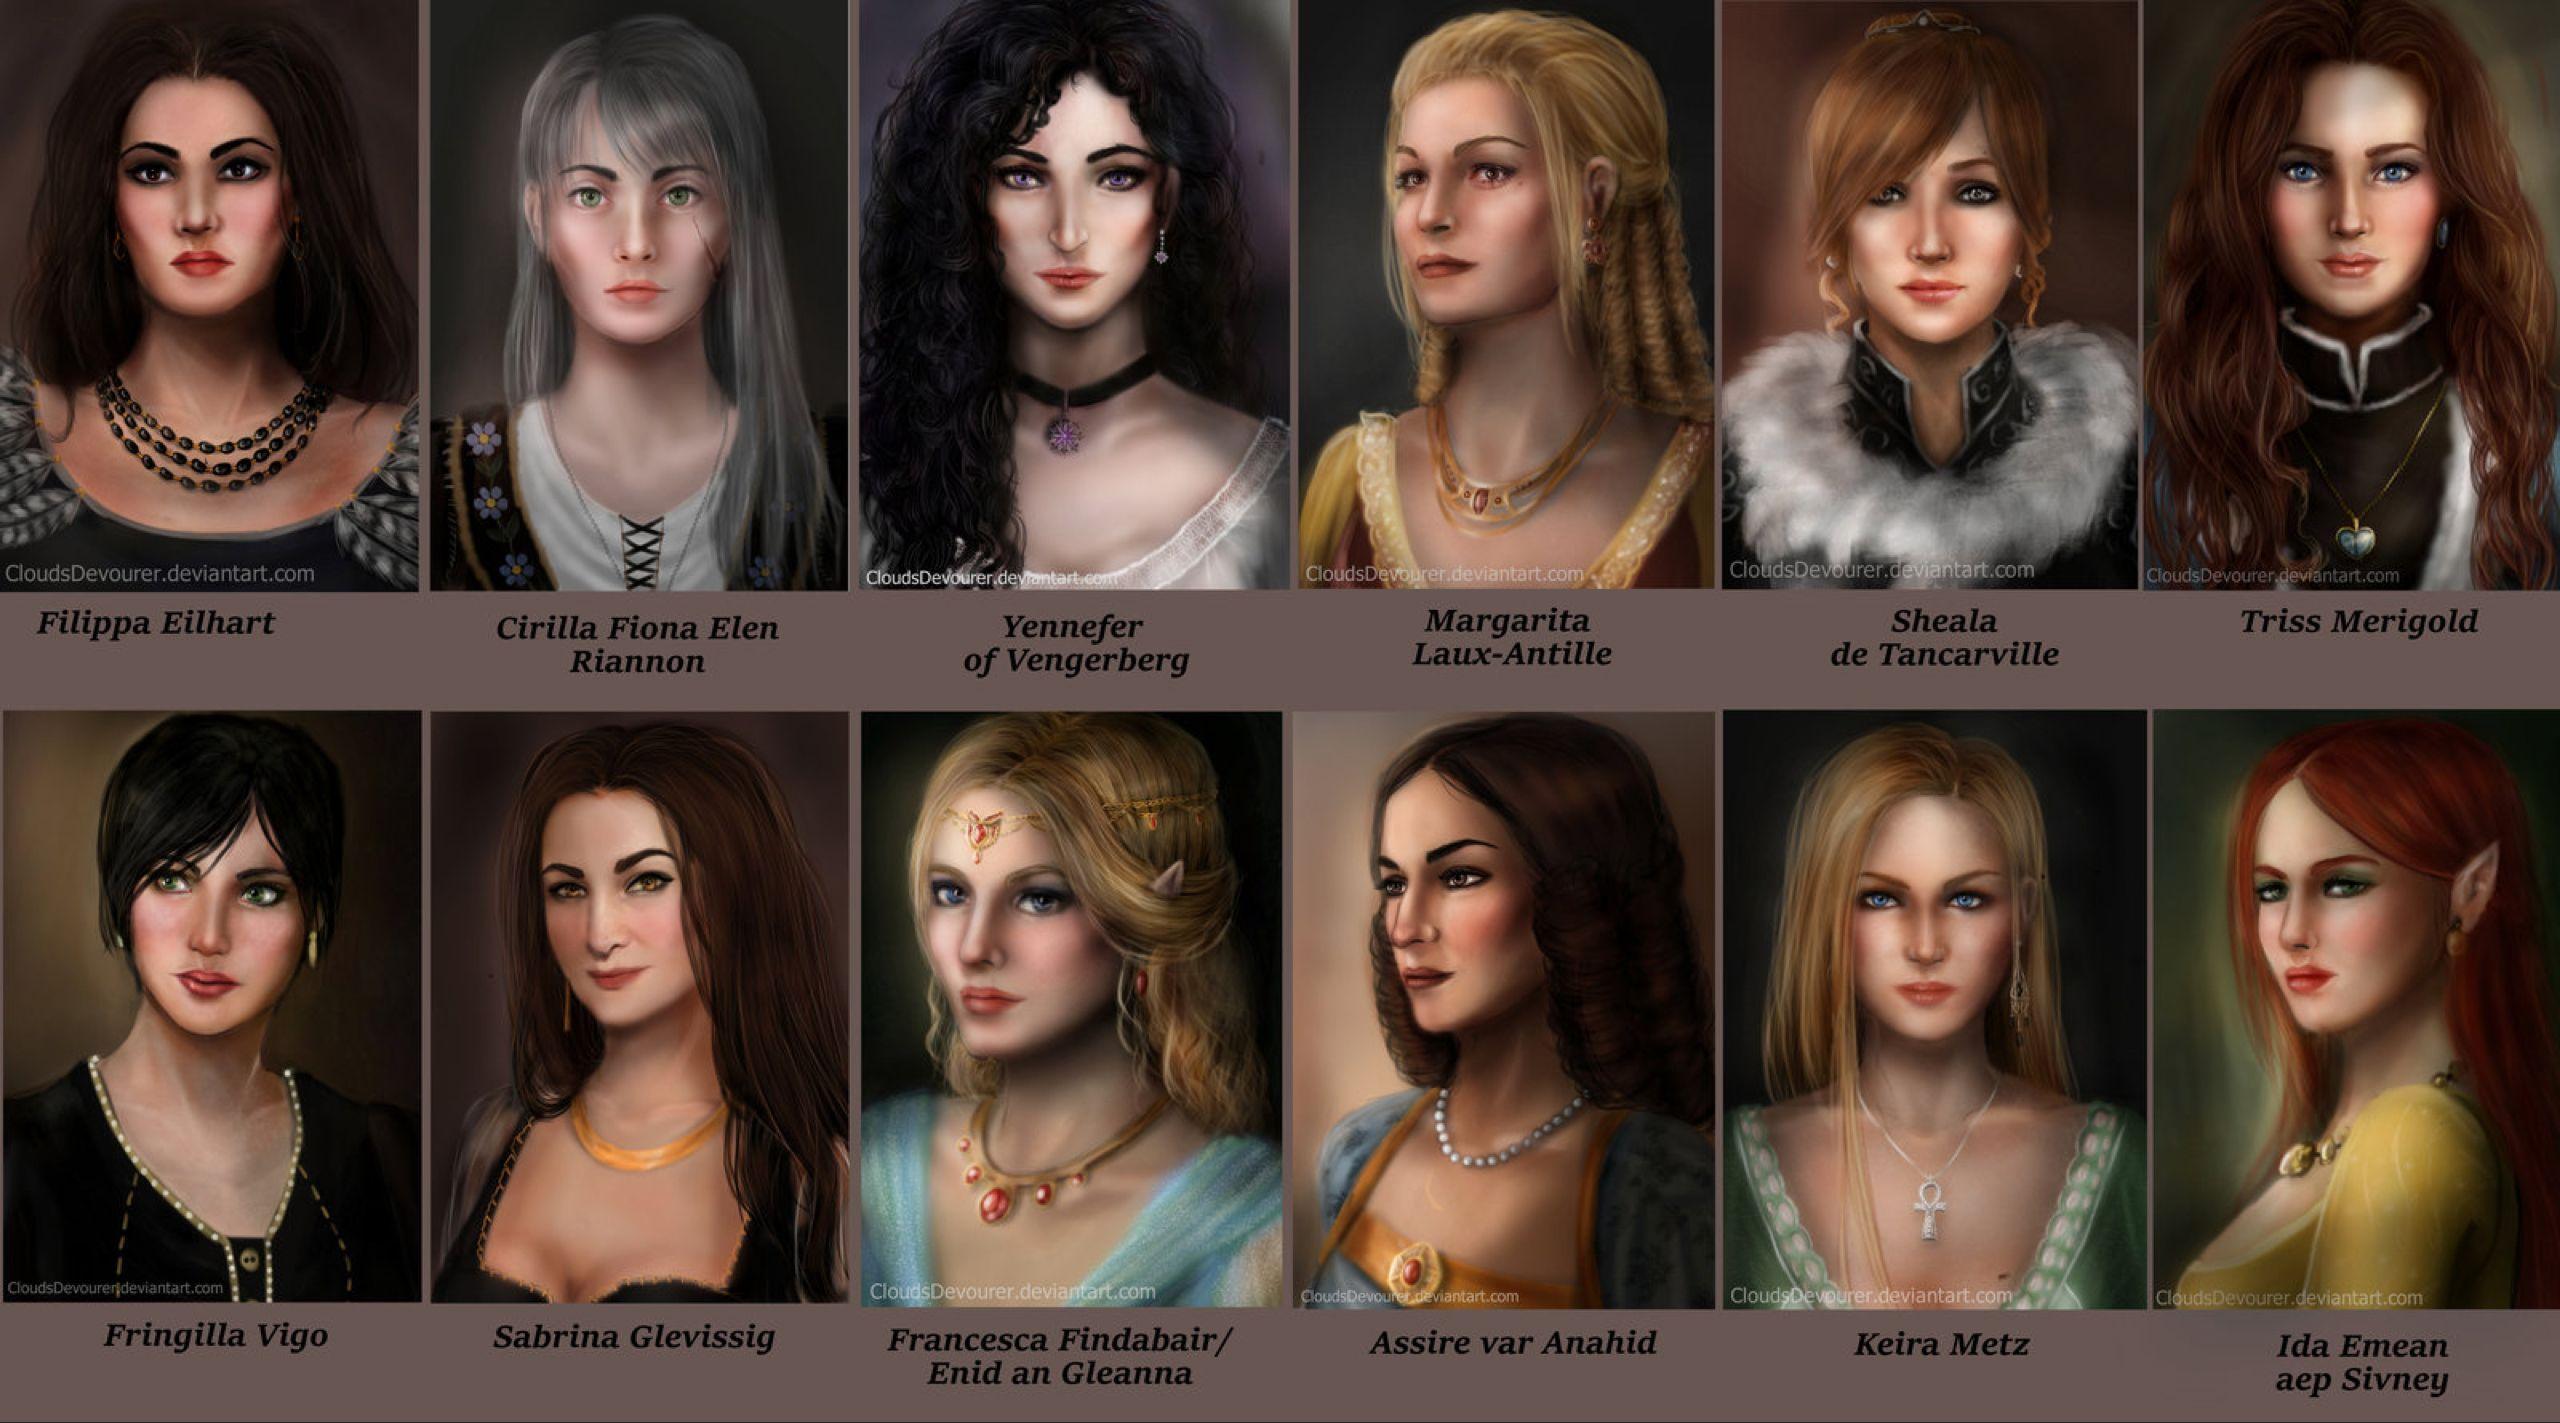 [Post Oficial] Geralt de Rivia/The Witcher, la serie de Netflix - Página 2 B2d7834811f4abe2684840b8016c6903